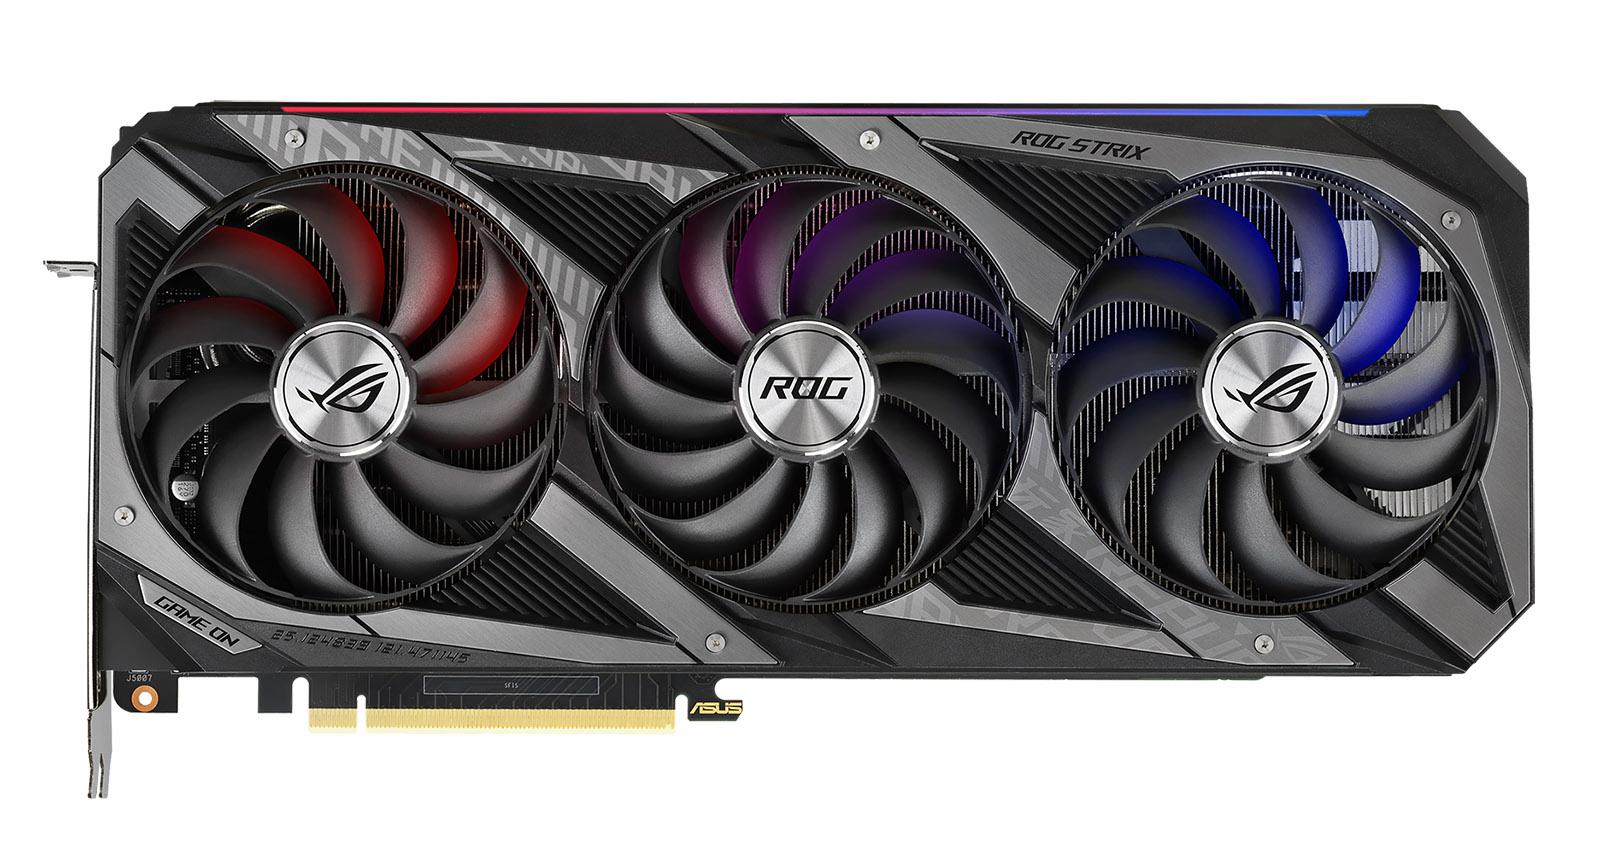 ASUS представила свои видеокарты на базе GeForce RTX 3080 Ti и RTX 3070 Ti